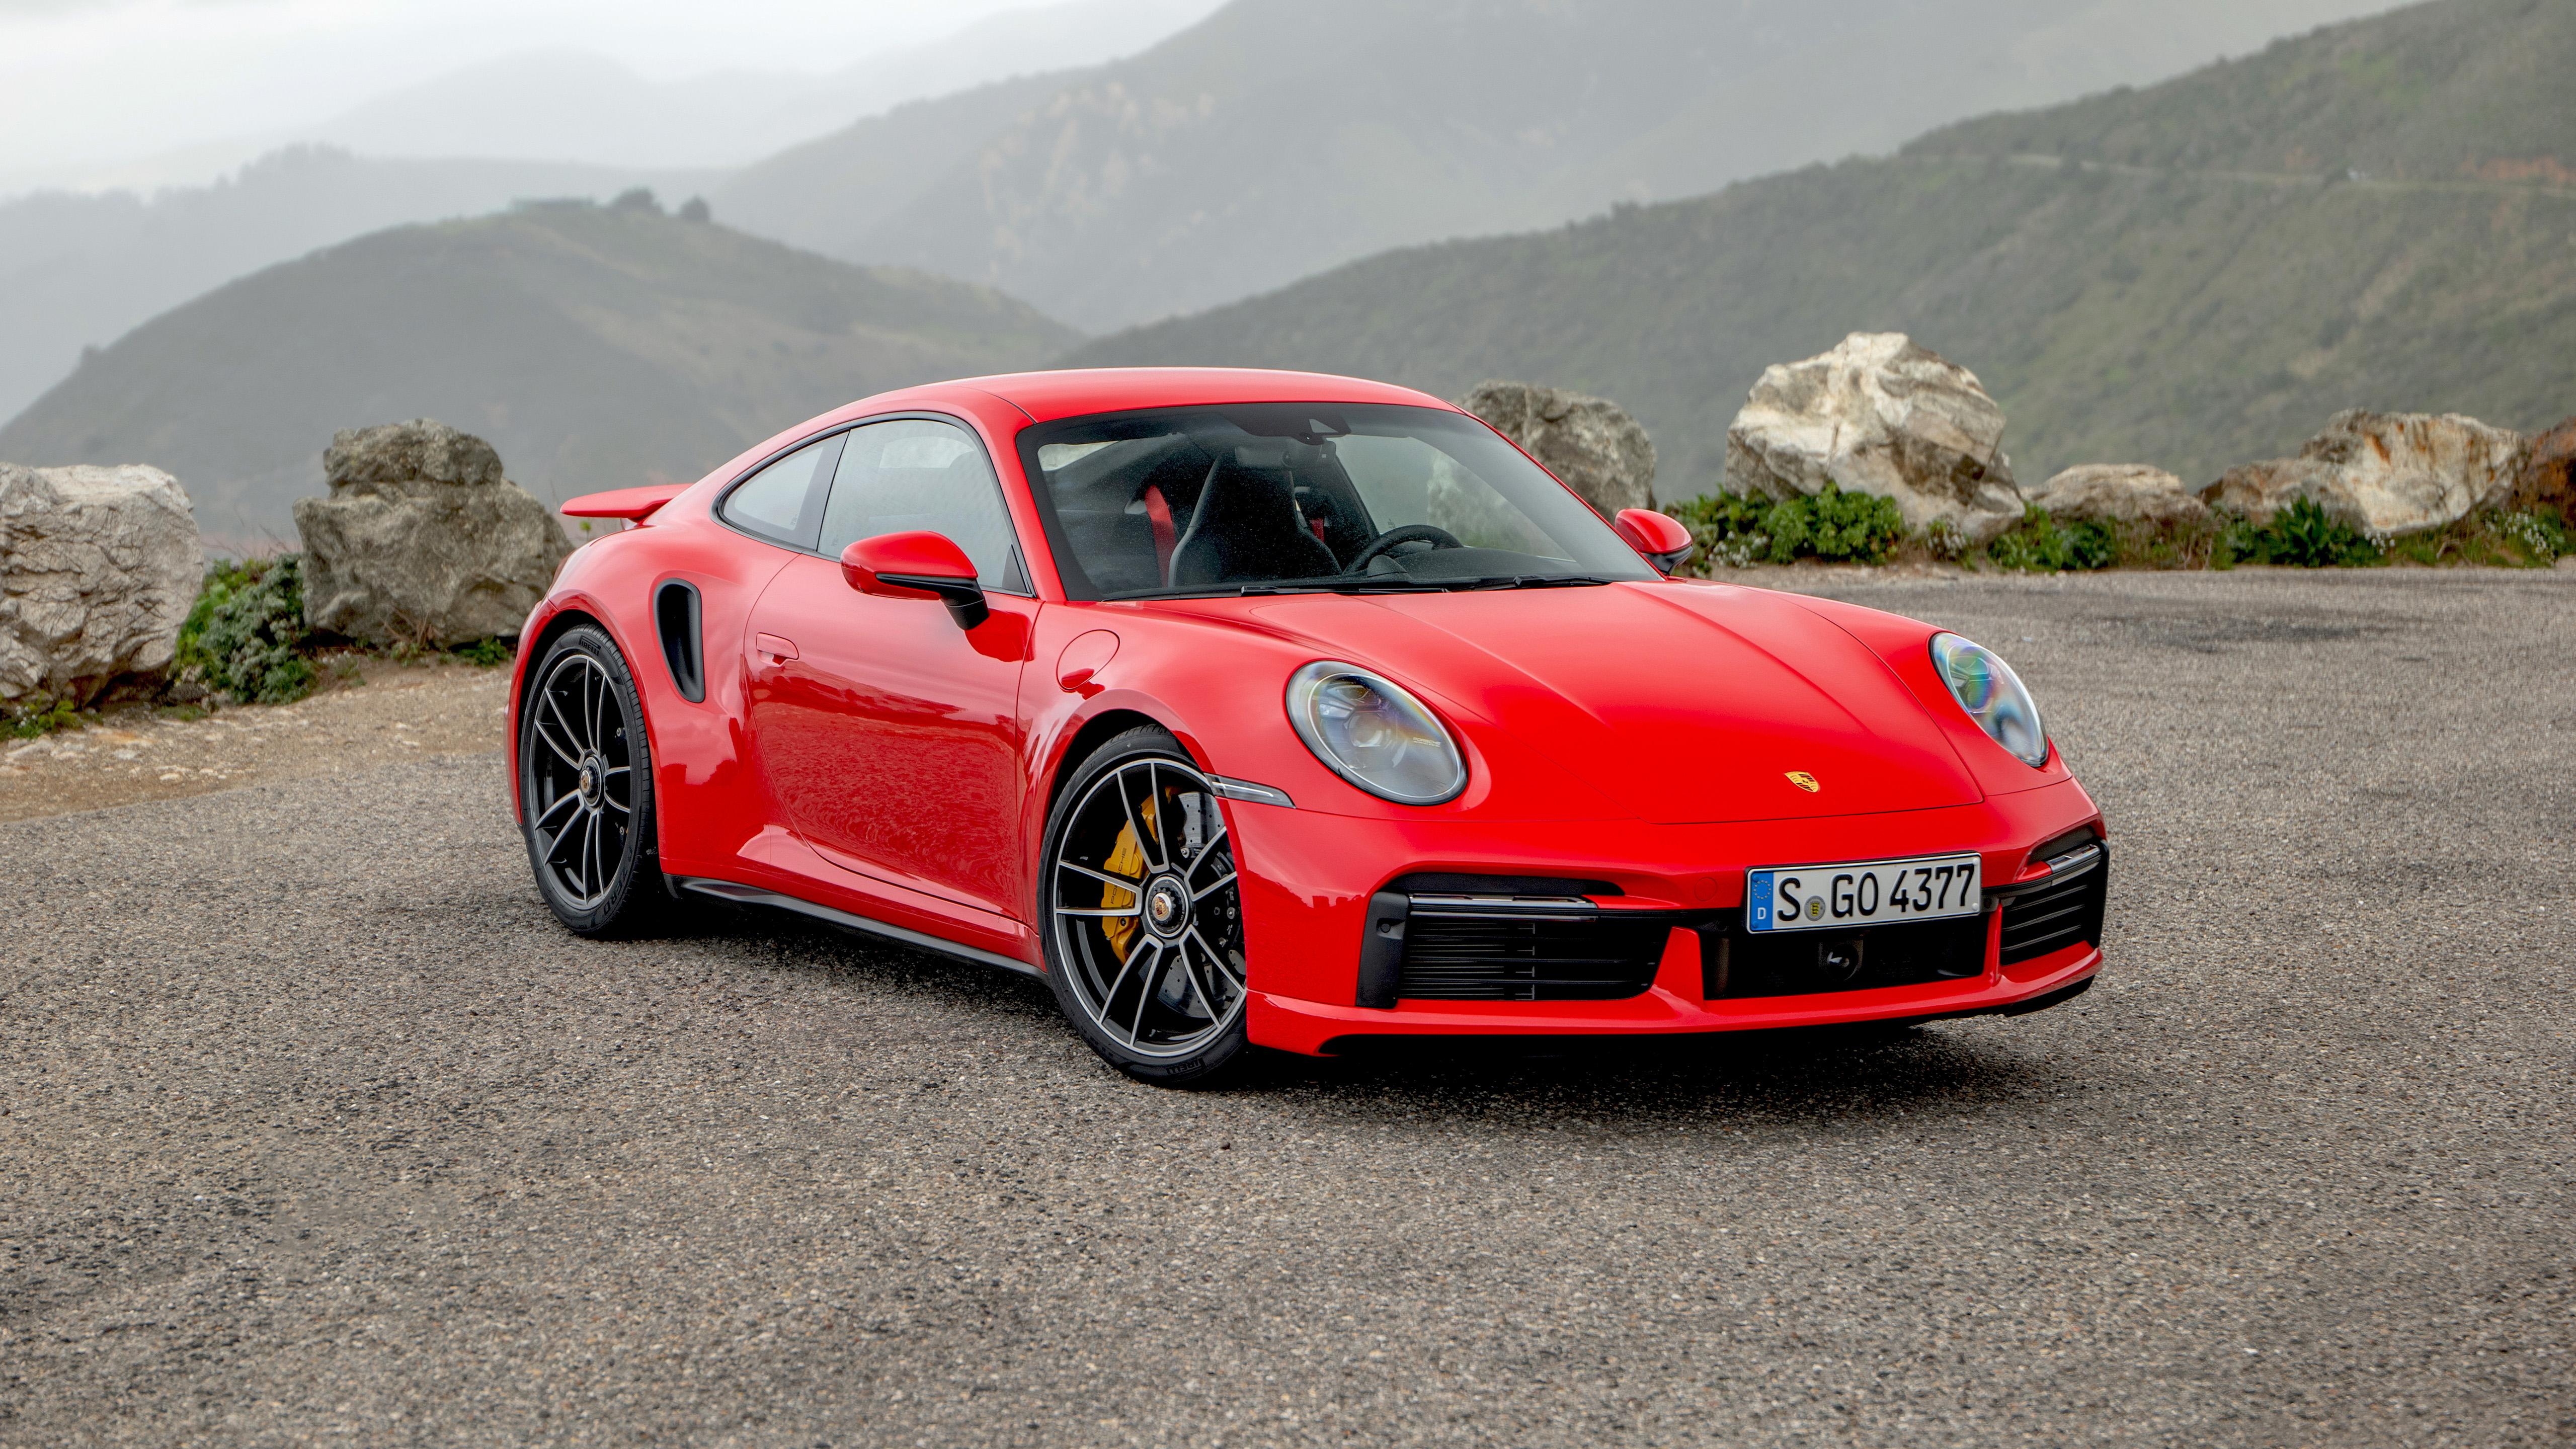 Porsche 911 Turbo S 2020 5K Wallpaper HD Car Wallpapers ID 14677 5120x2880